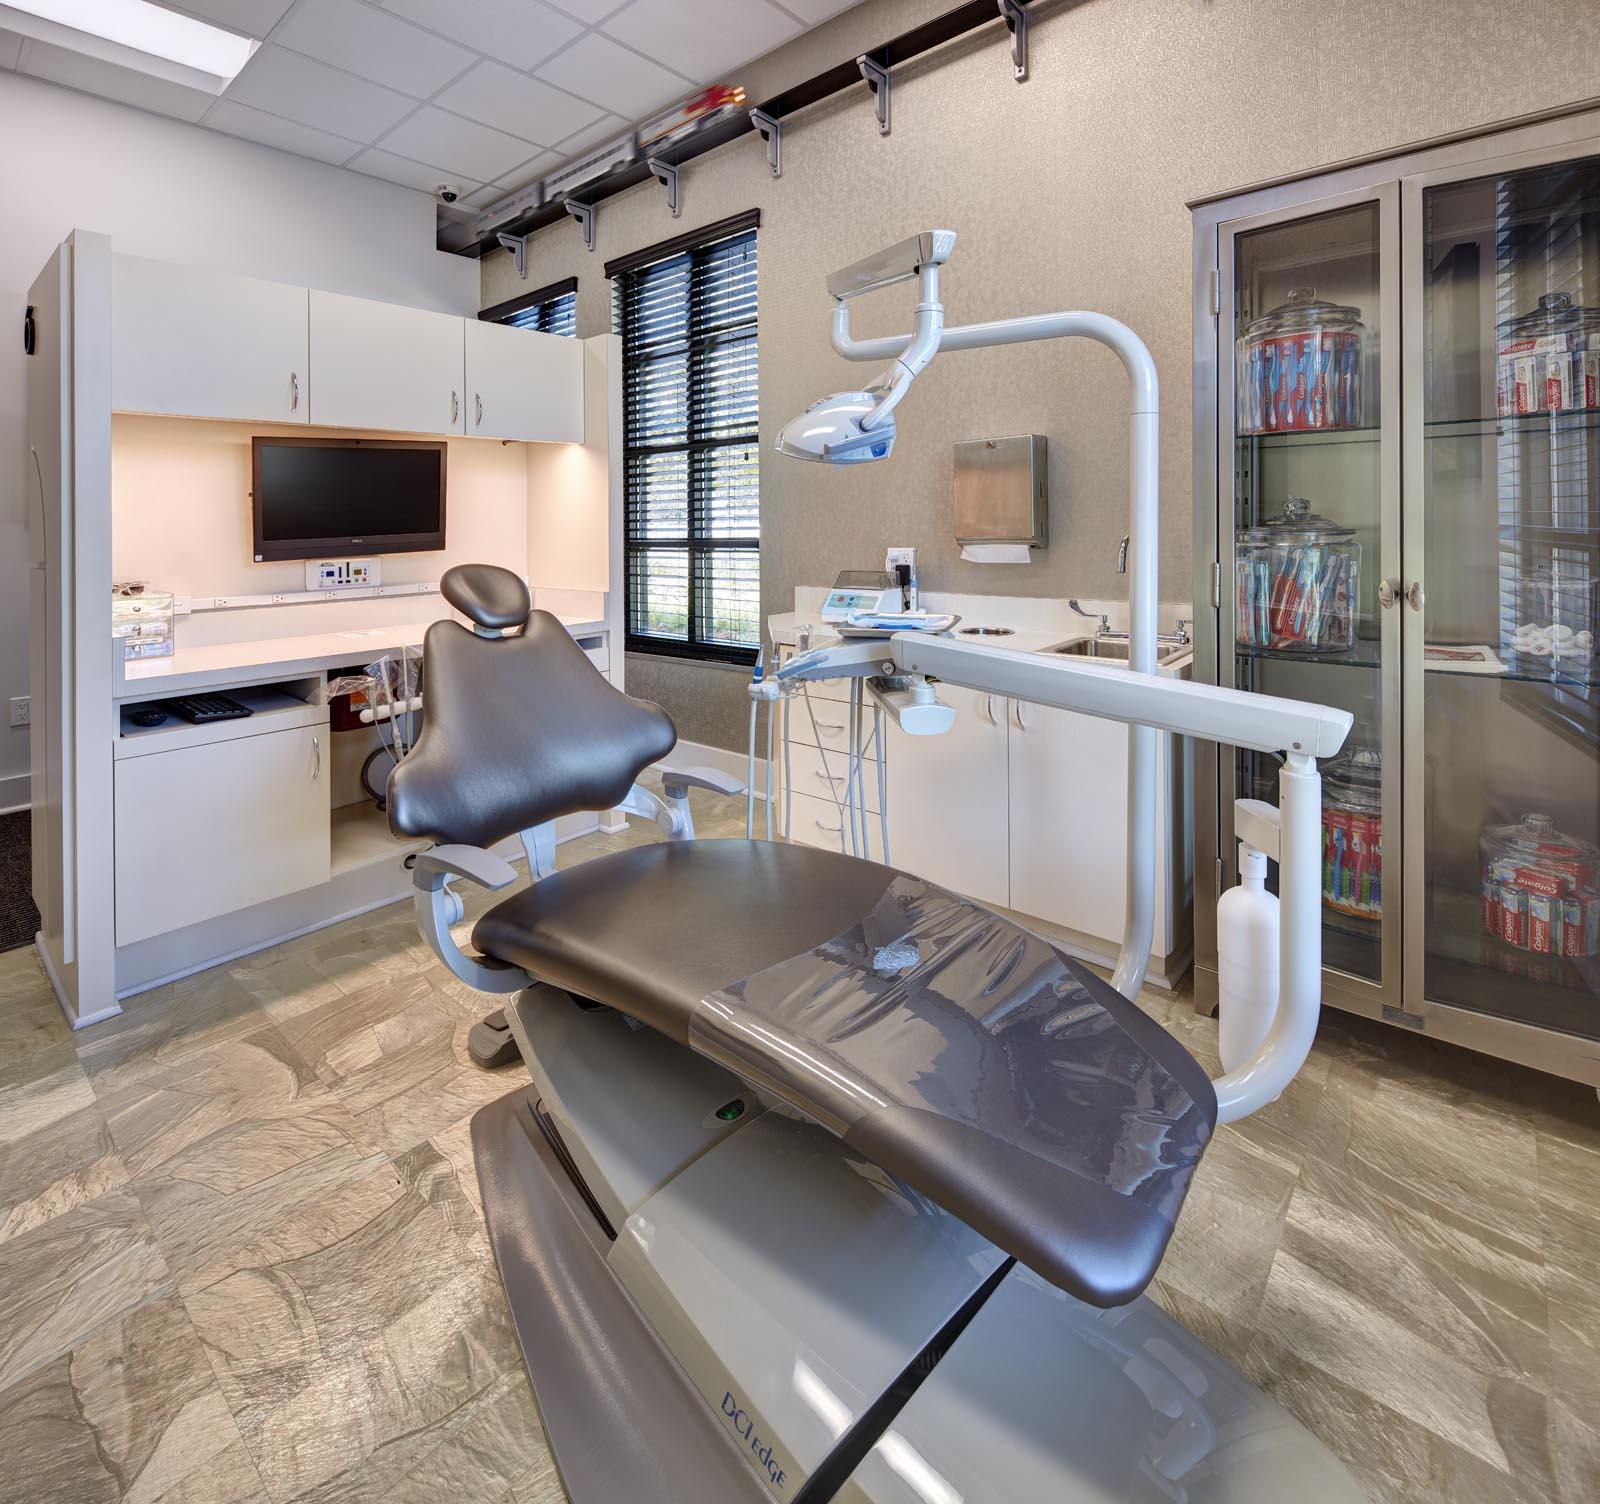 Dempsey Dental Express Santee